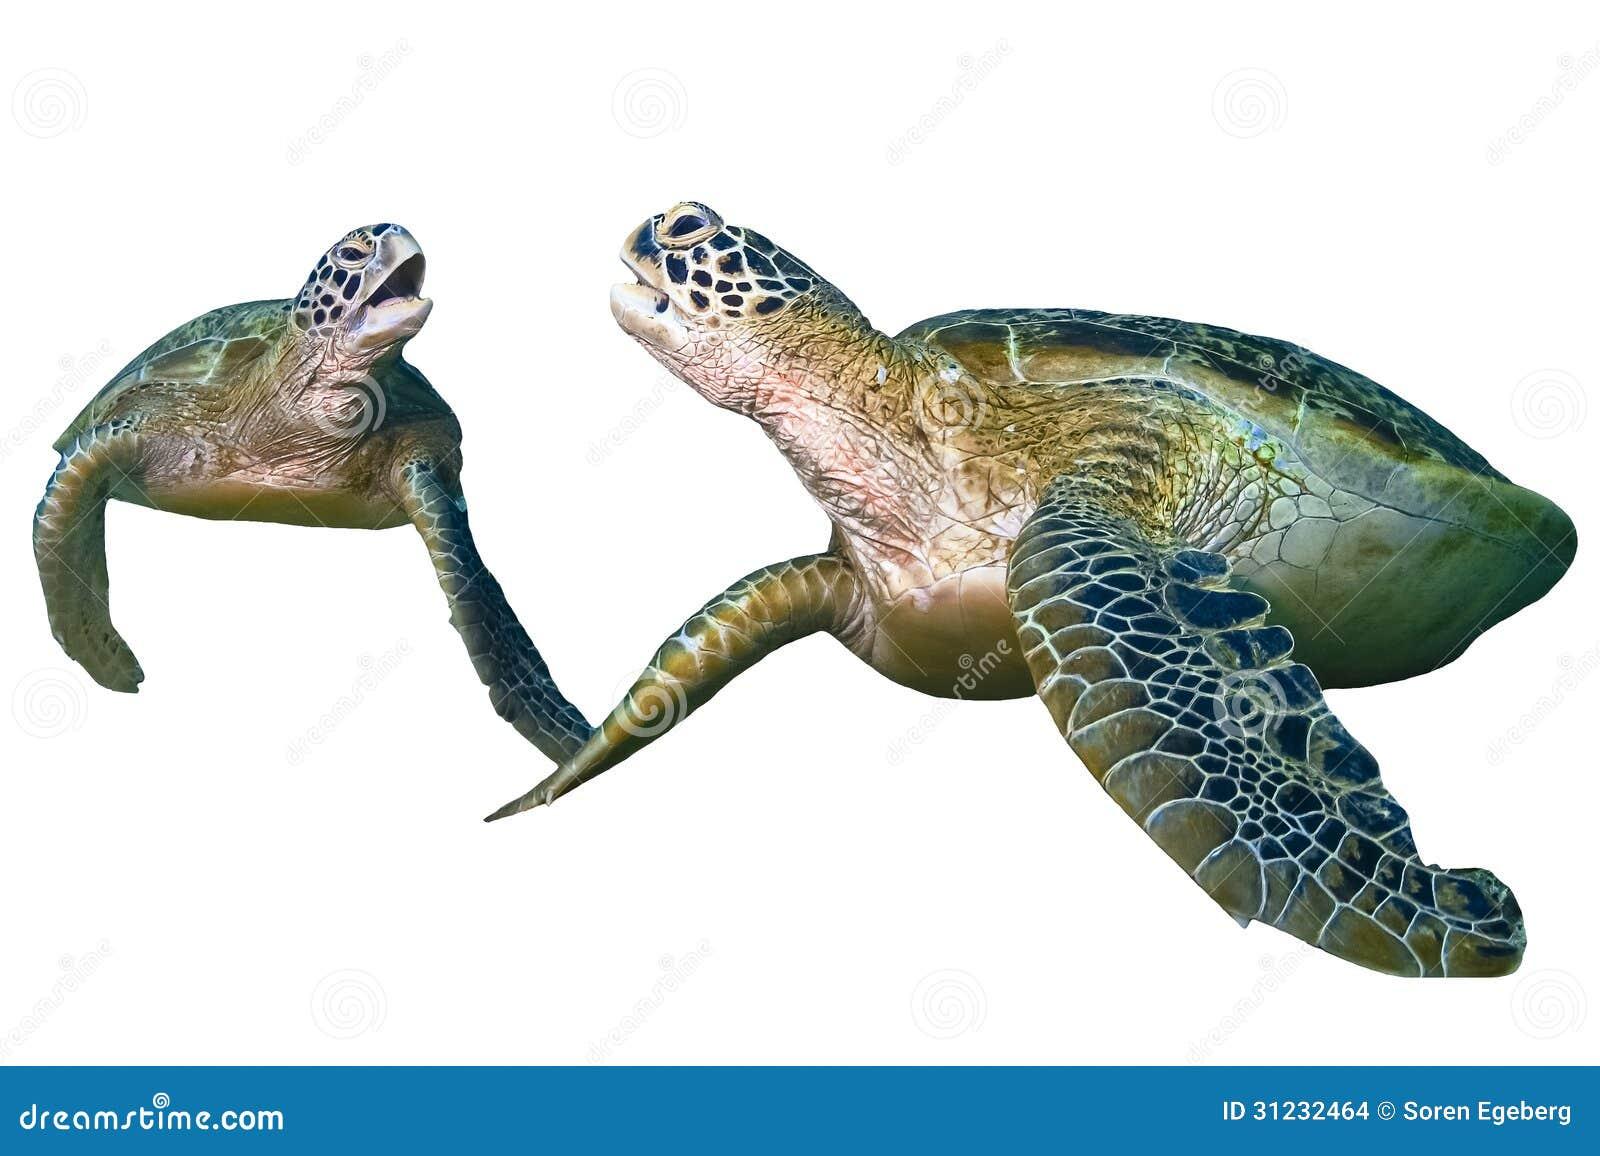 turtle white background - photo #47